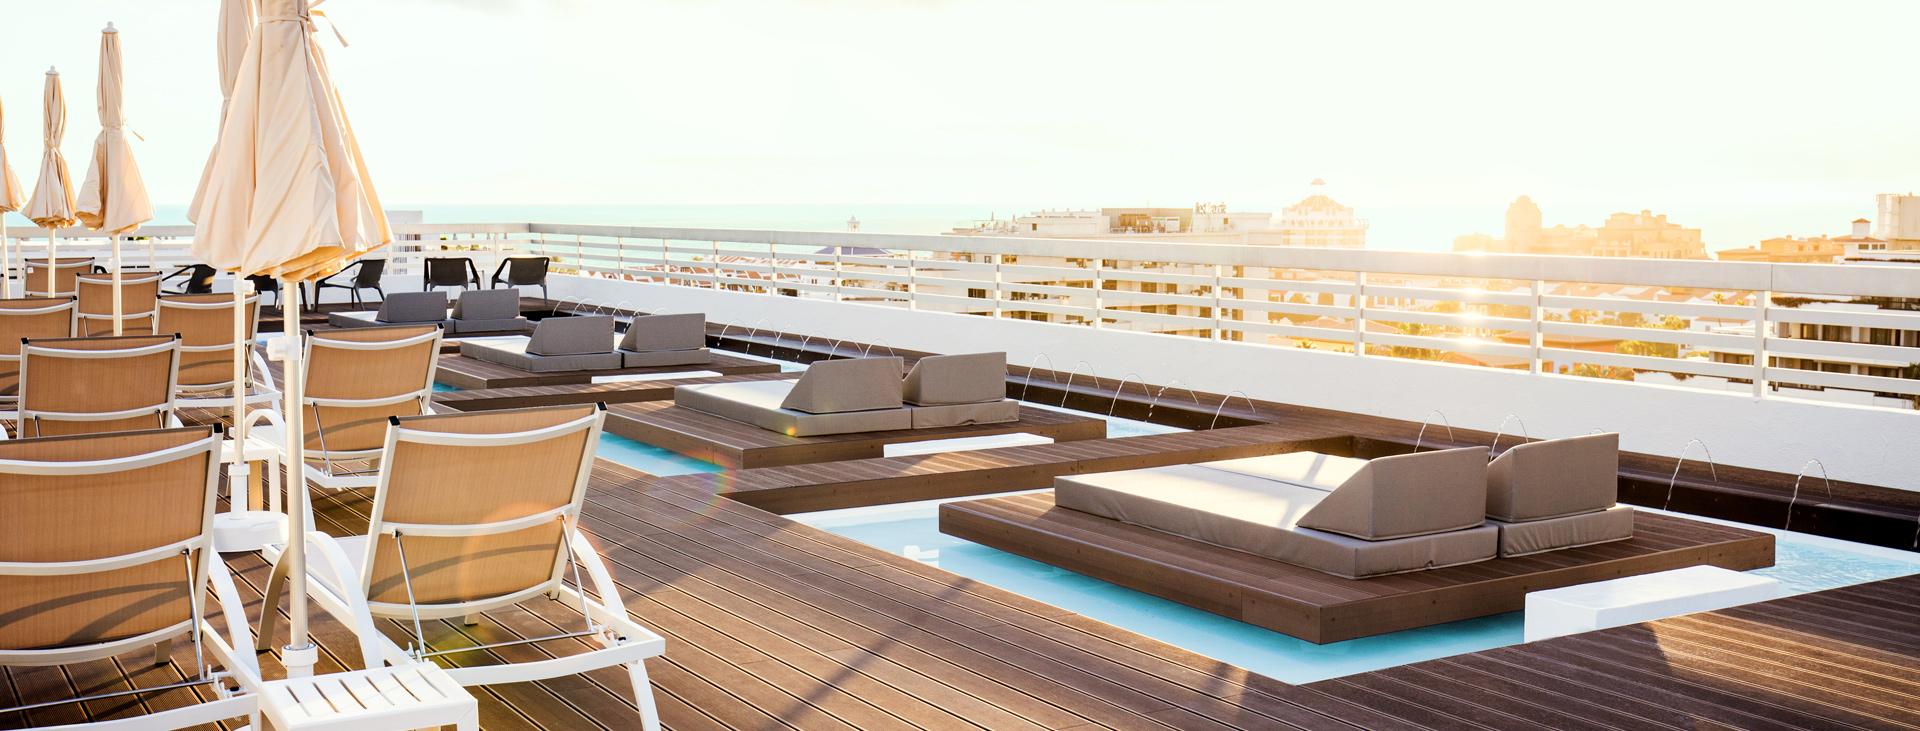 Sunprime Coral Suites & Spa, Playa de las Américas, Tenerife, Kanariøyene